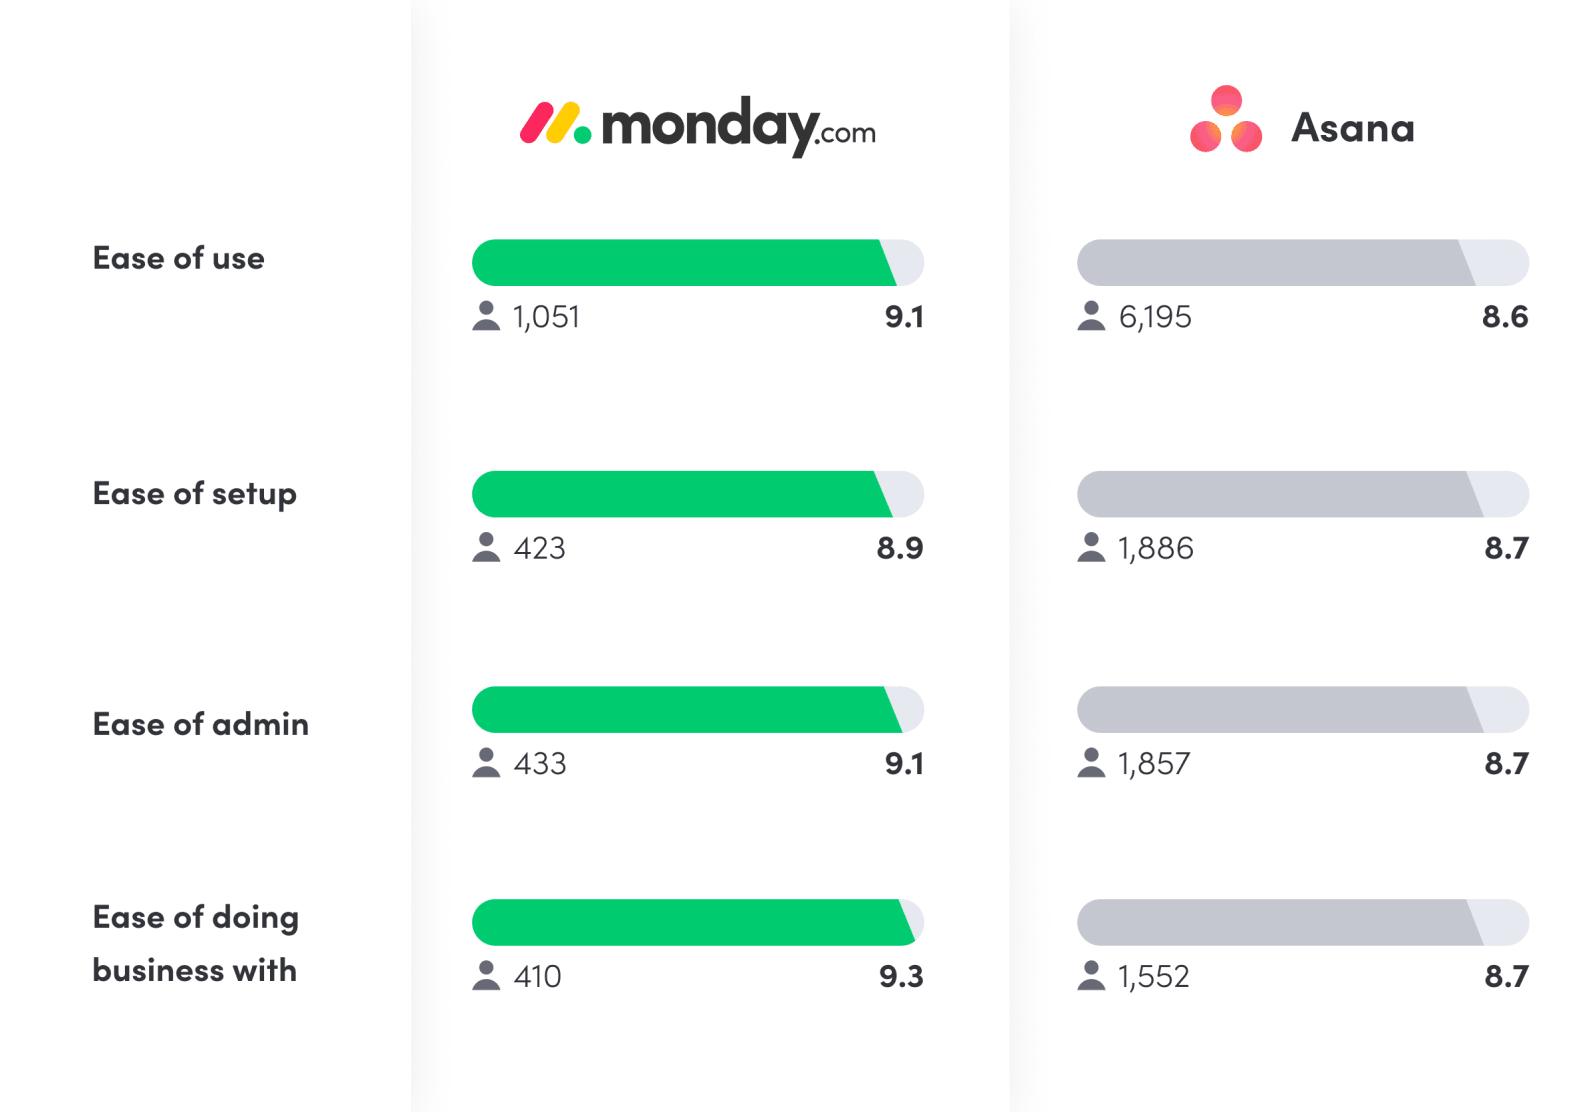 monday.com vs. Asana G2 customer reviews